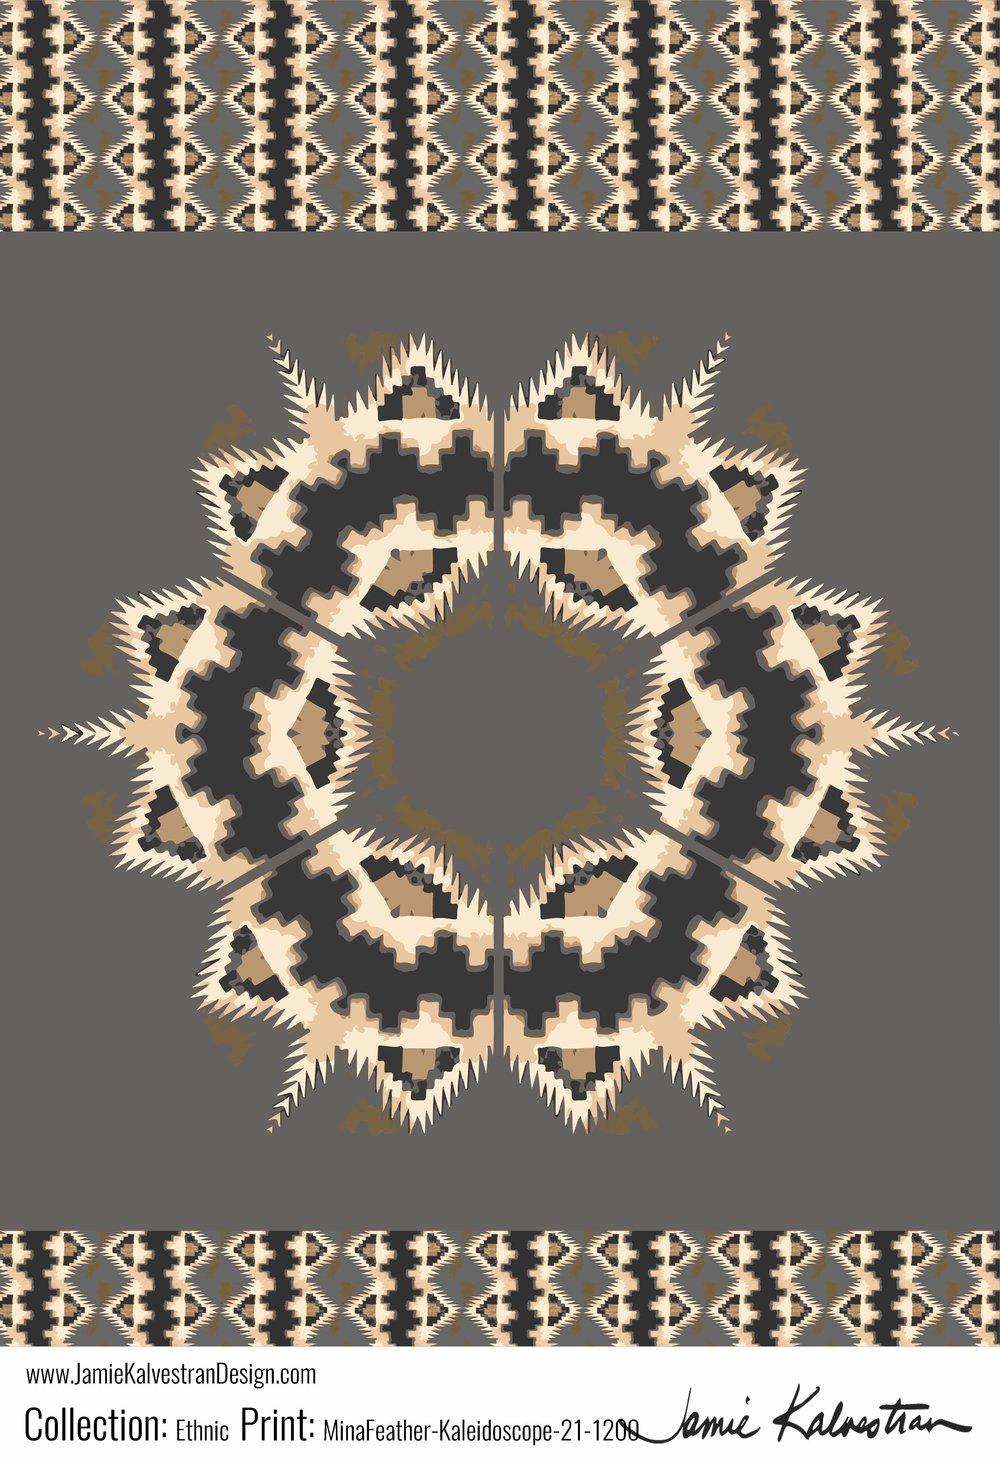 Jamie_Kalvestran_EthnicGeo_MinaFeather-Kaleidoscope-21-1200.jpg